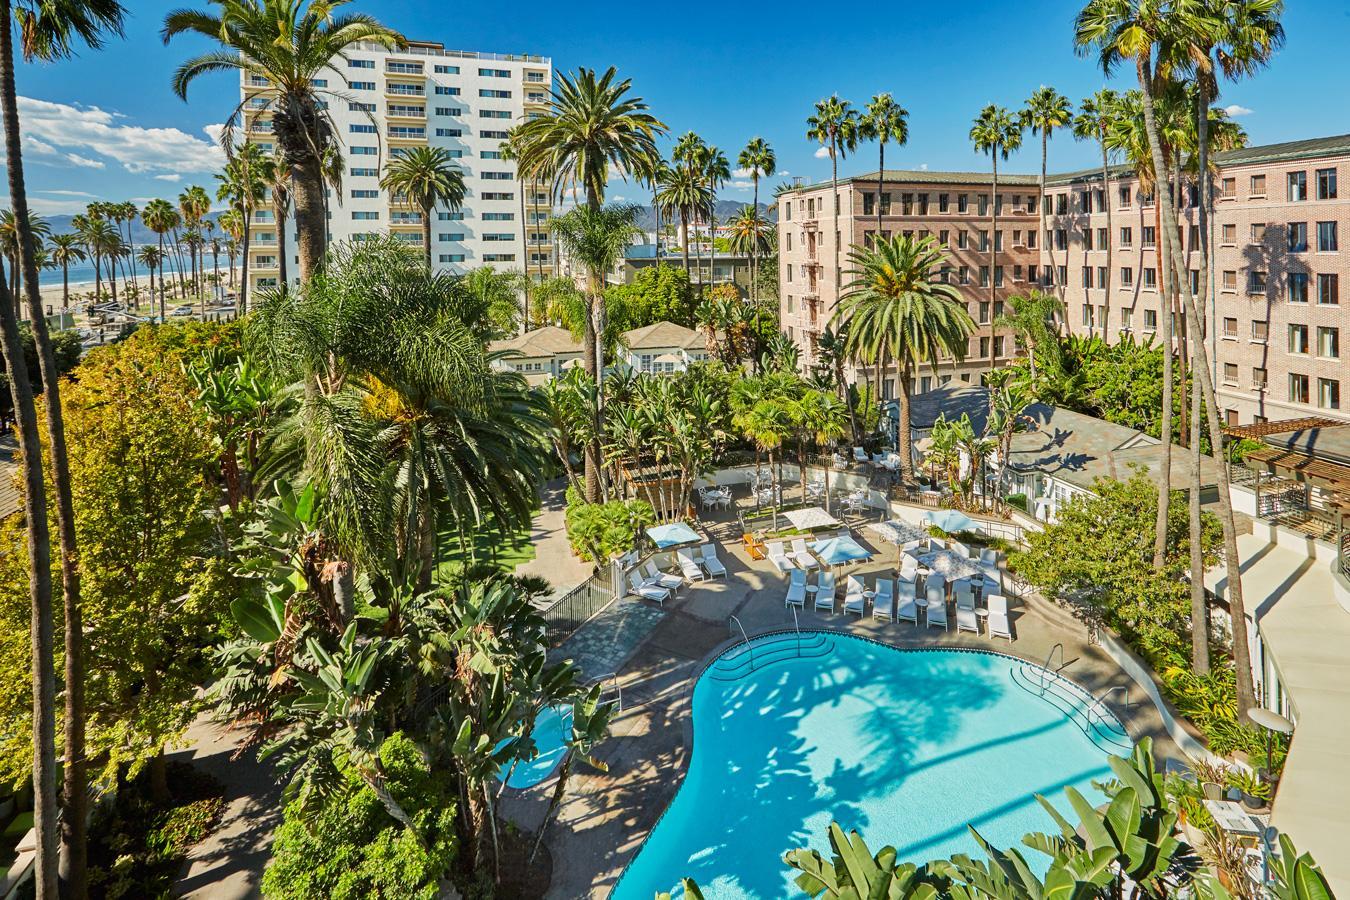 Fairmont Miramar Hotel & Bungalows   Carefree Vacations